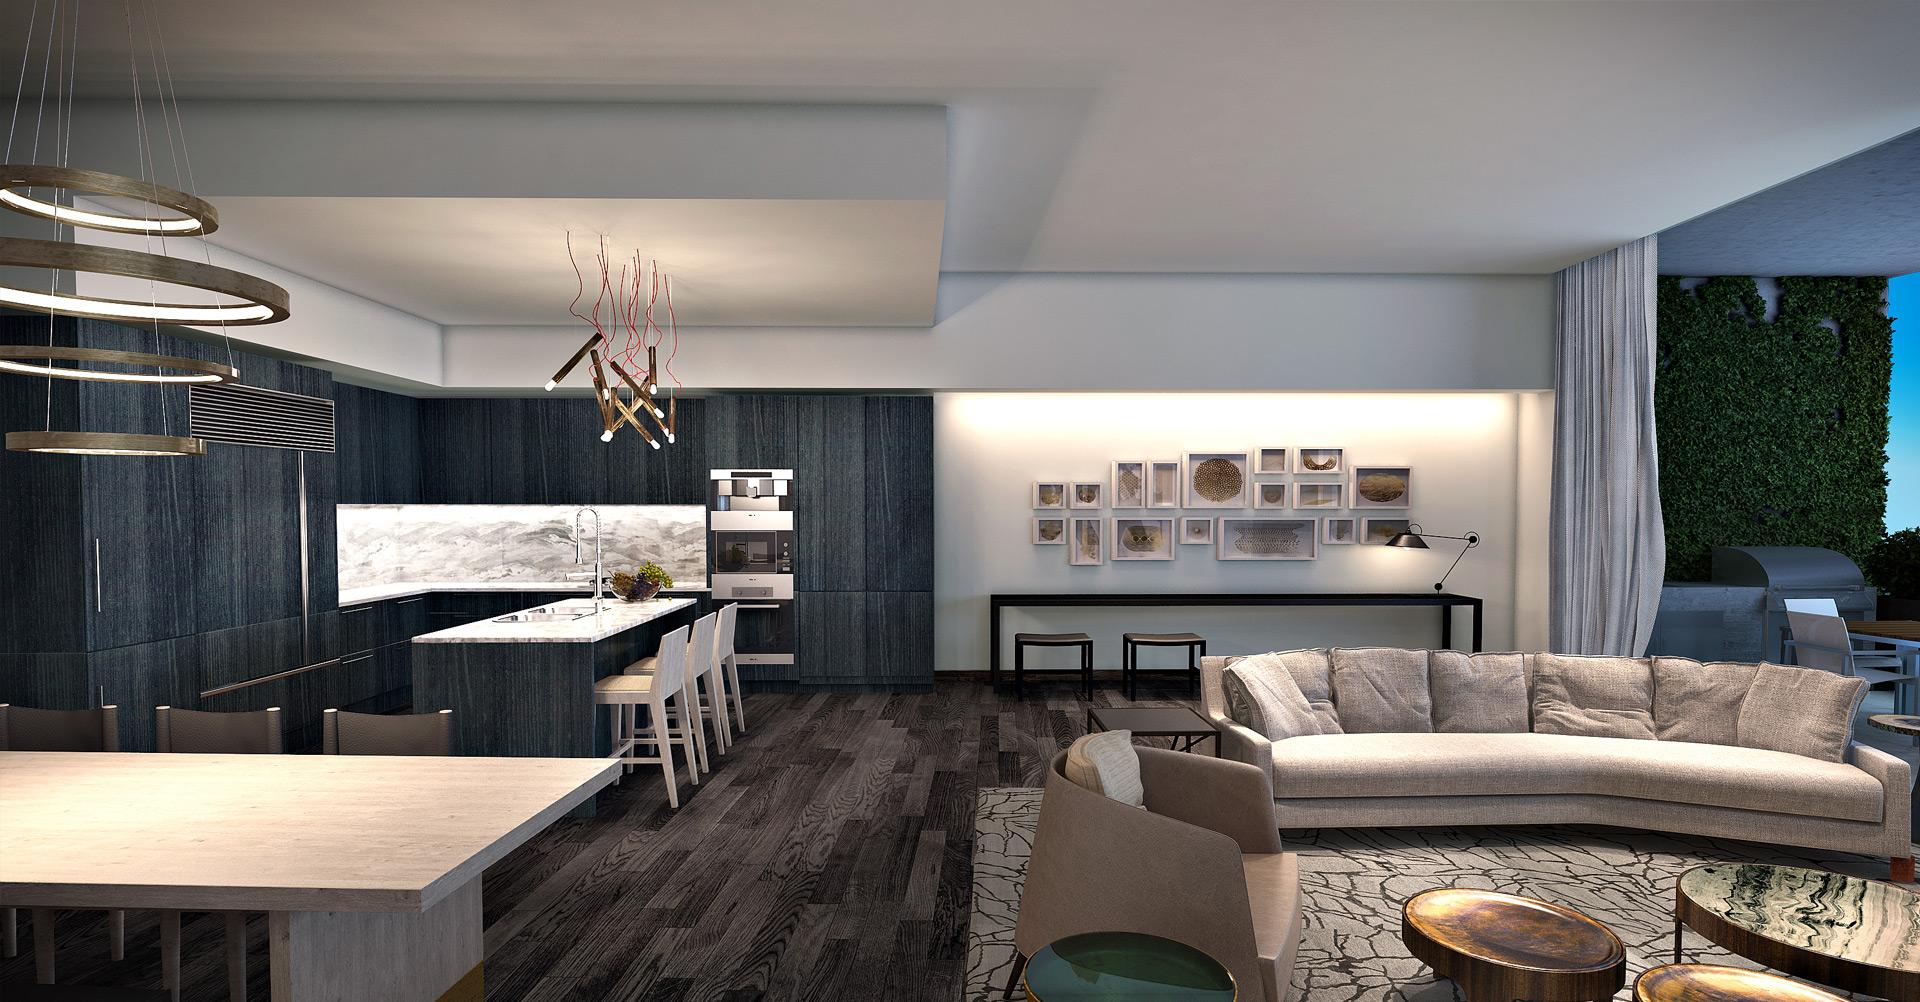 Kitchen Design Tampa And Ventura